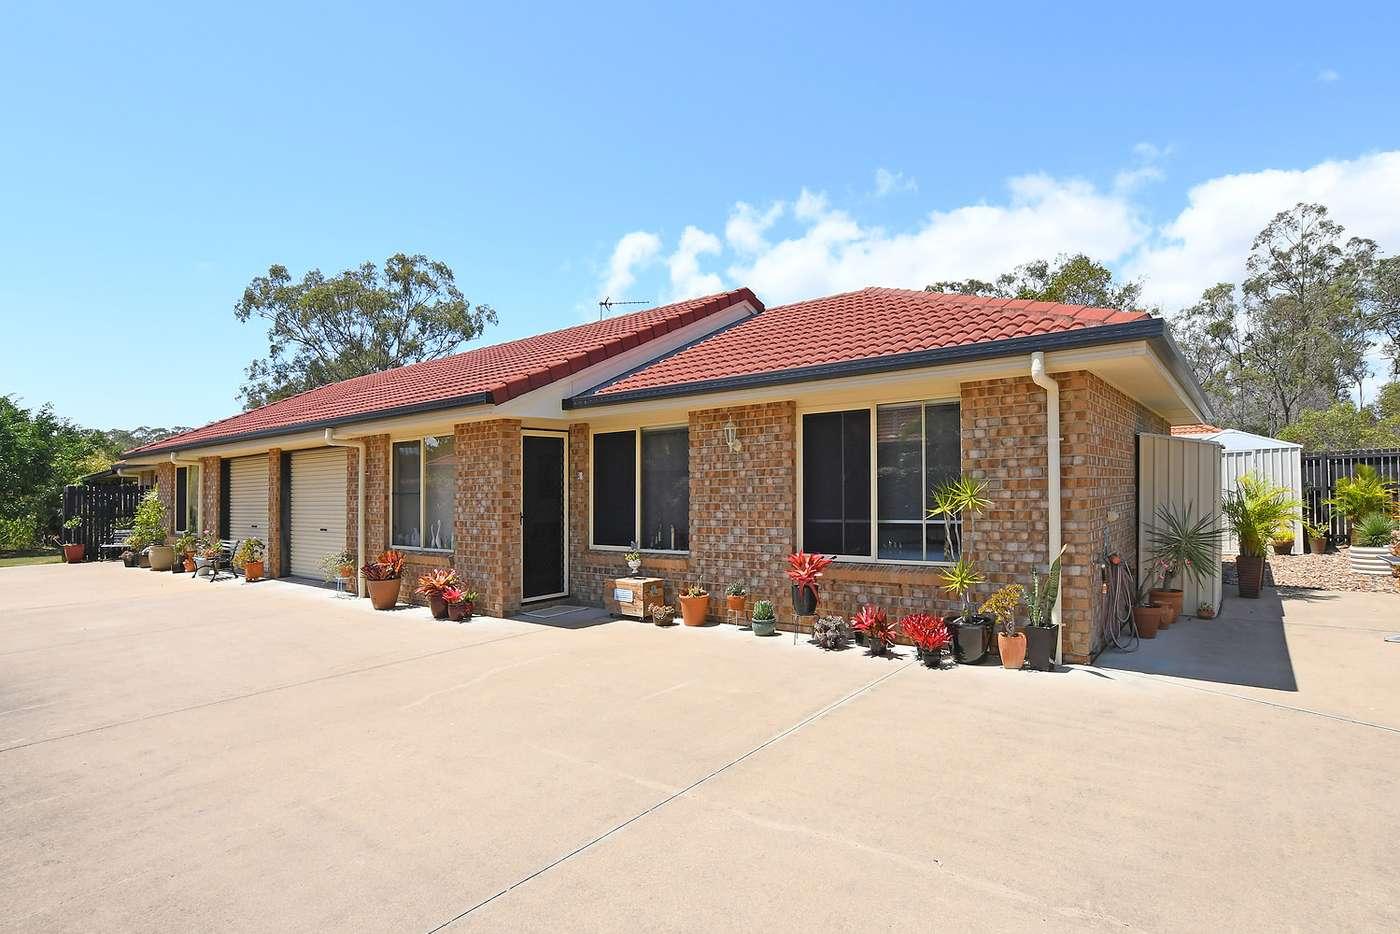 Main view of Homely semiDetached listing, Unit 1, 112 BIDEFORD STREET, Torquay QLD 4655